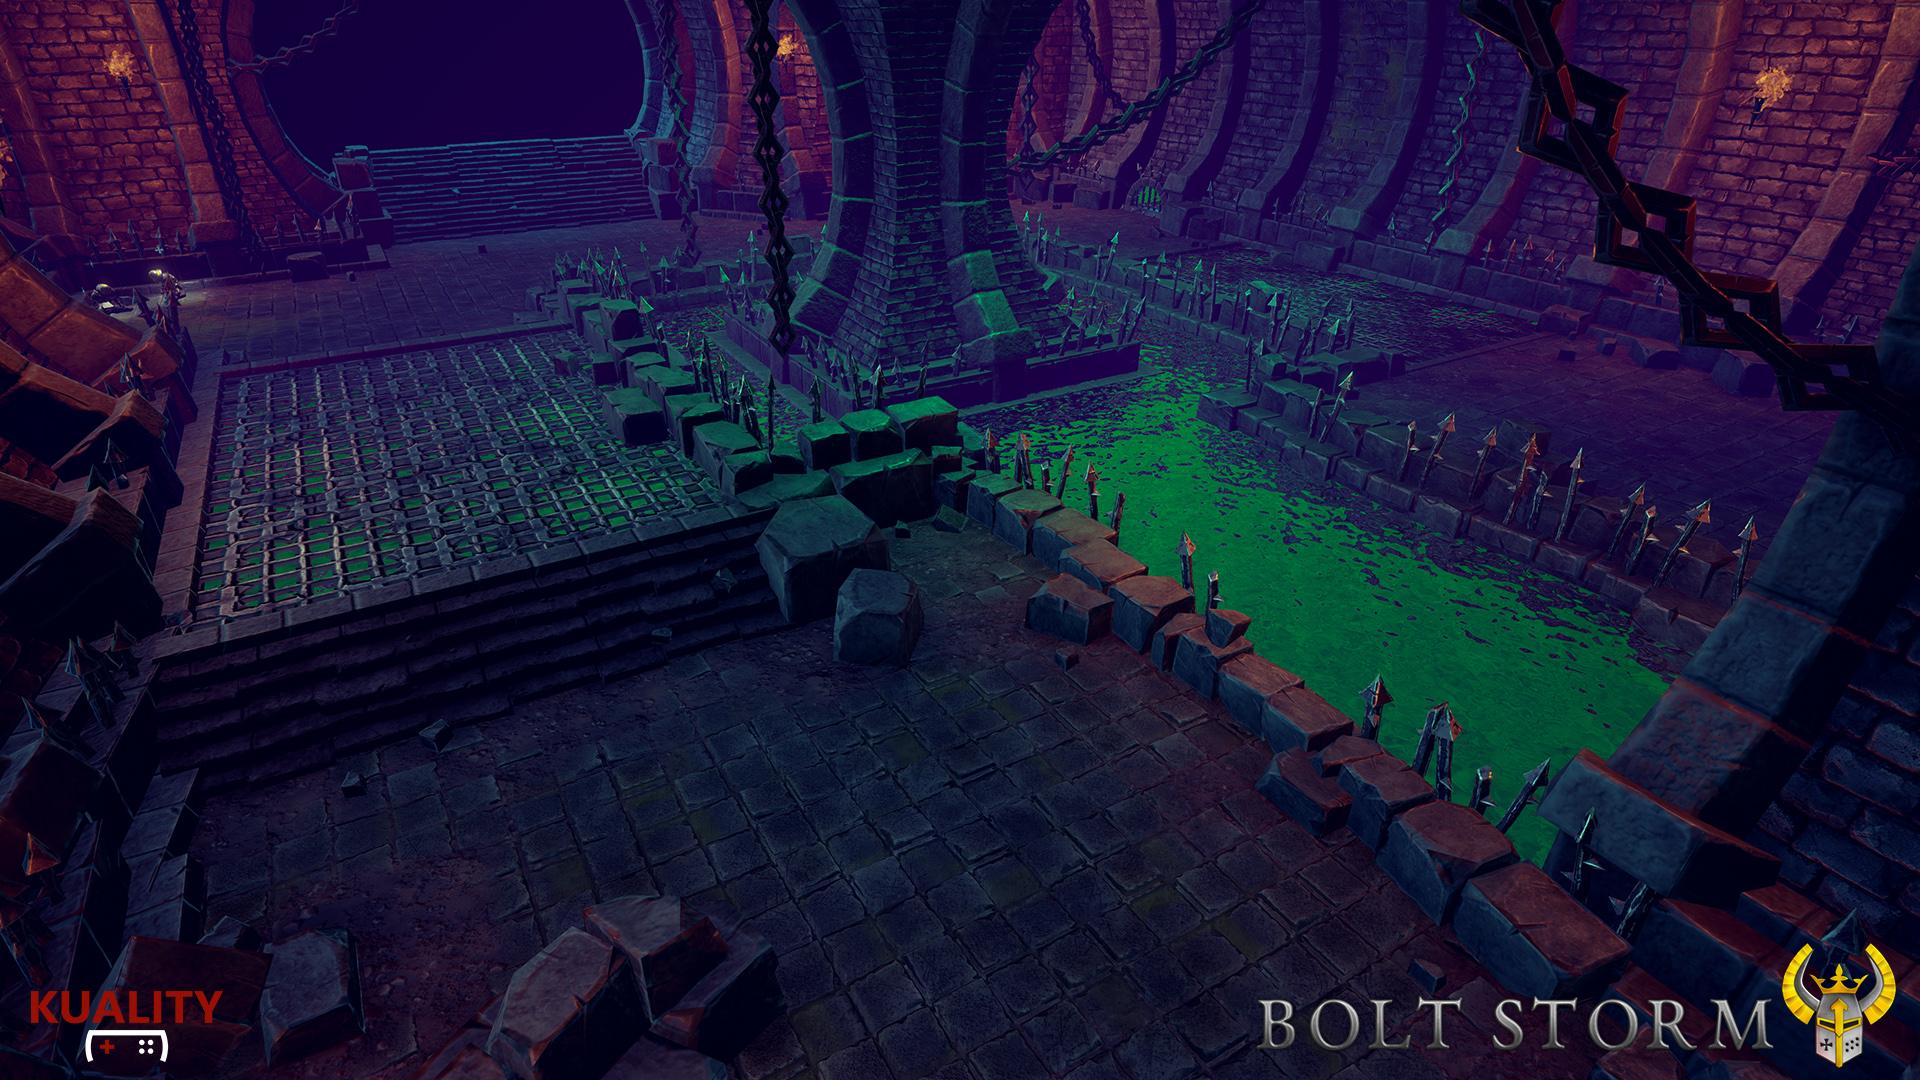 Bolt Storm - Sewer Area